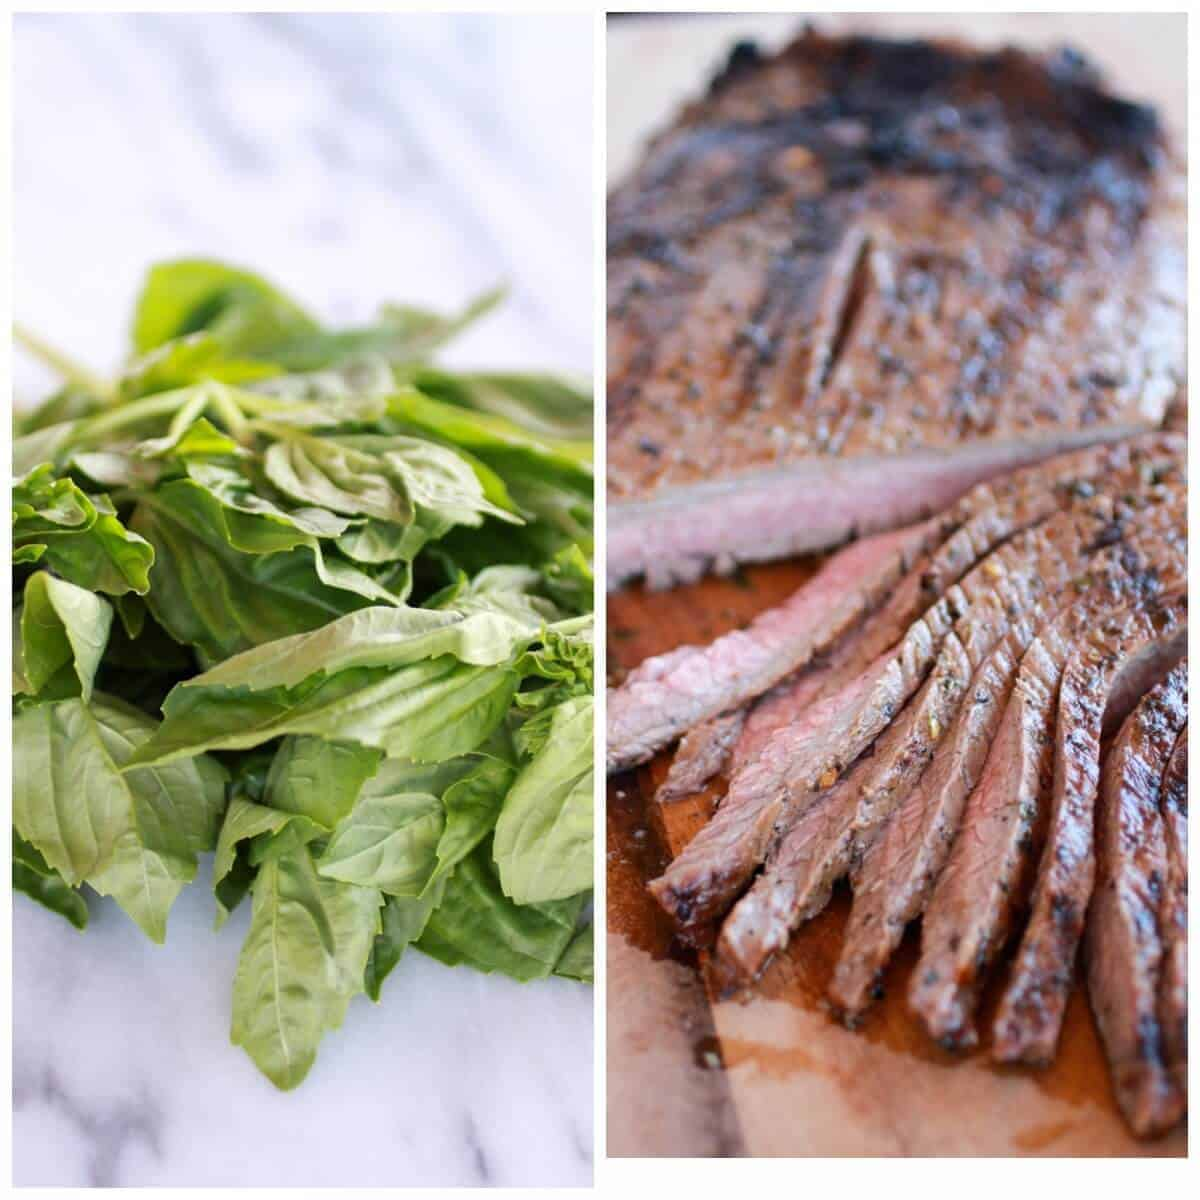 Greek Steak and Pesto Salad Gyros | http://www.halfbakedharvest.com/